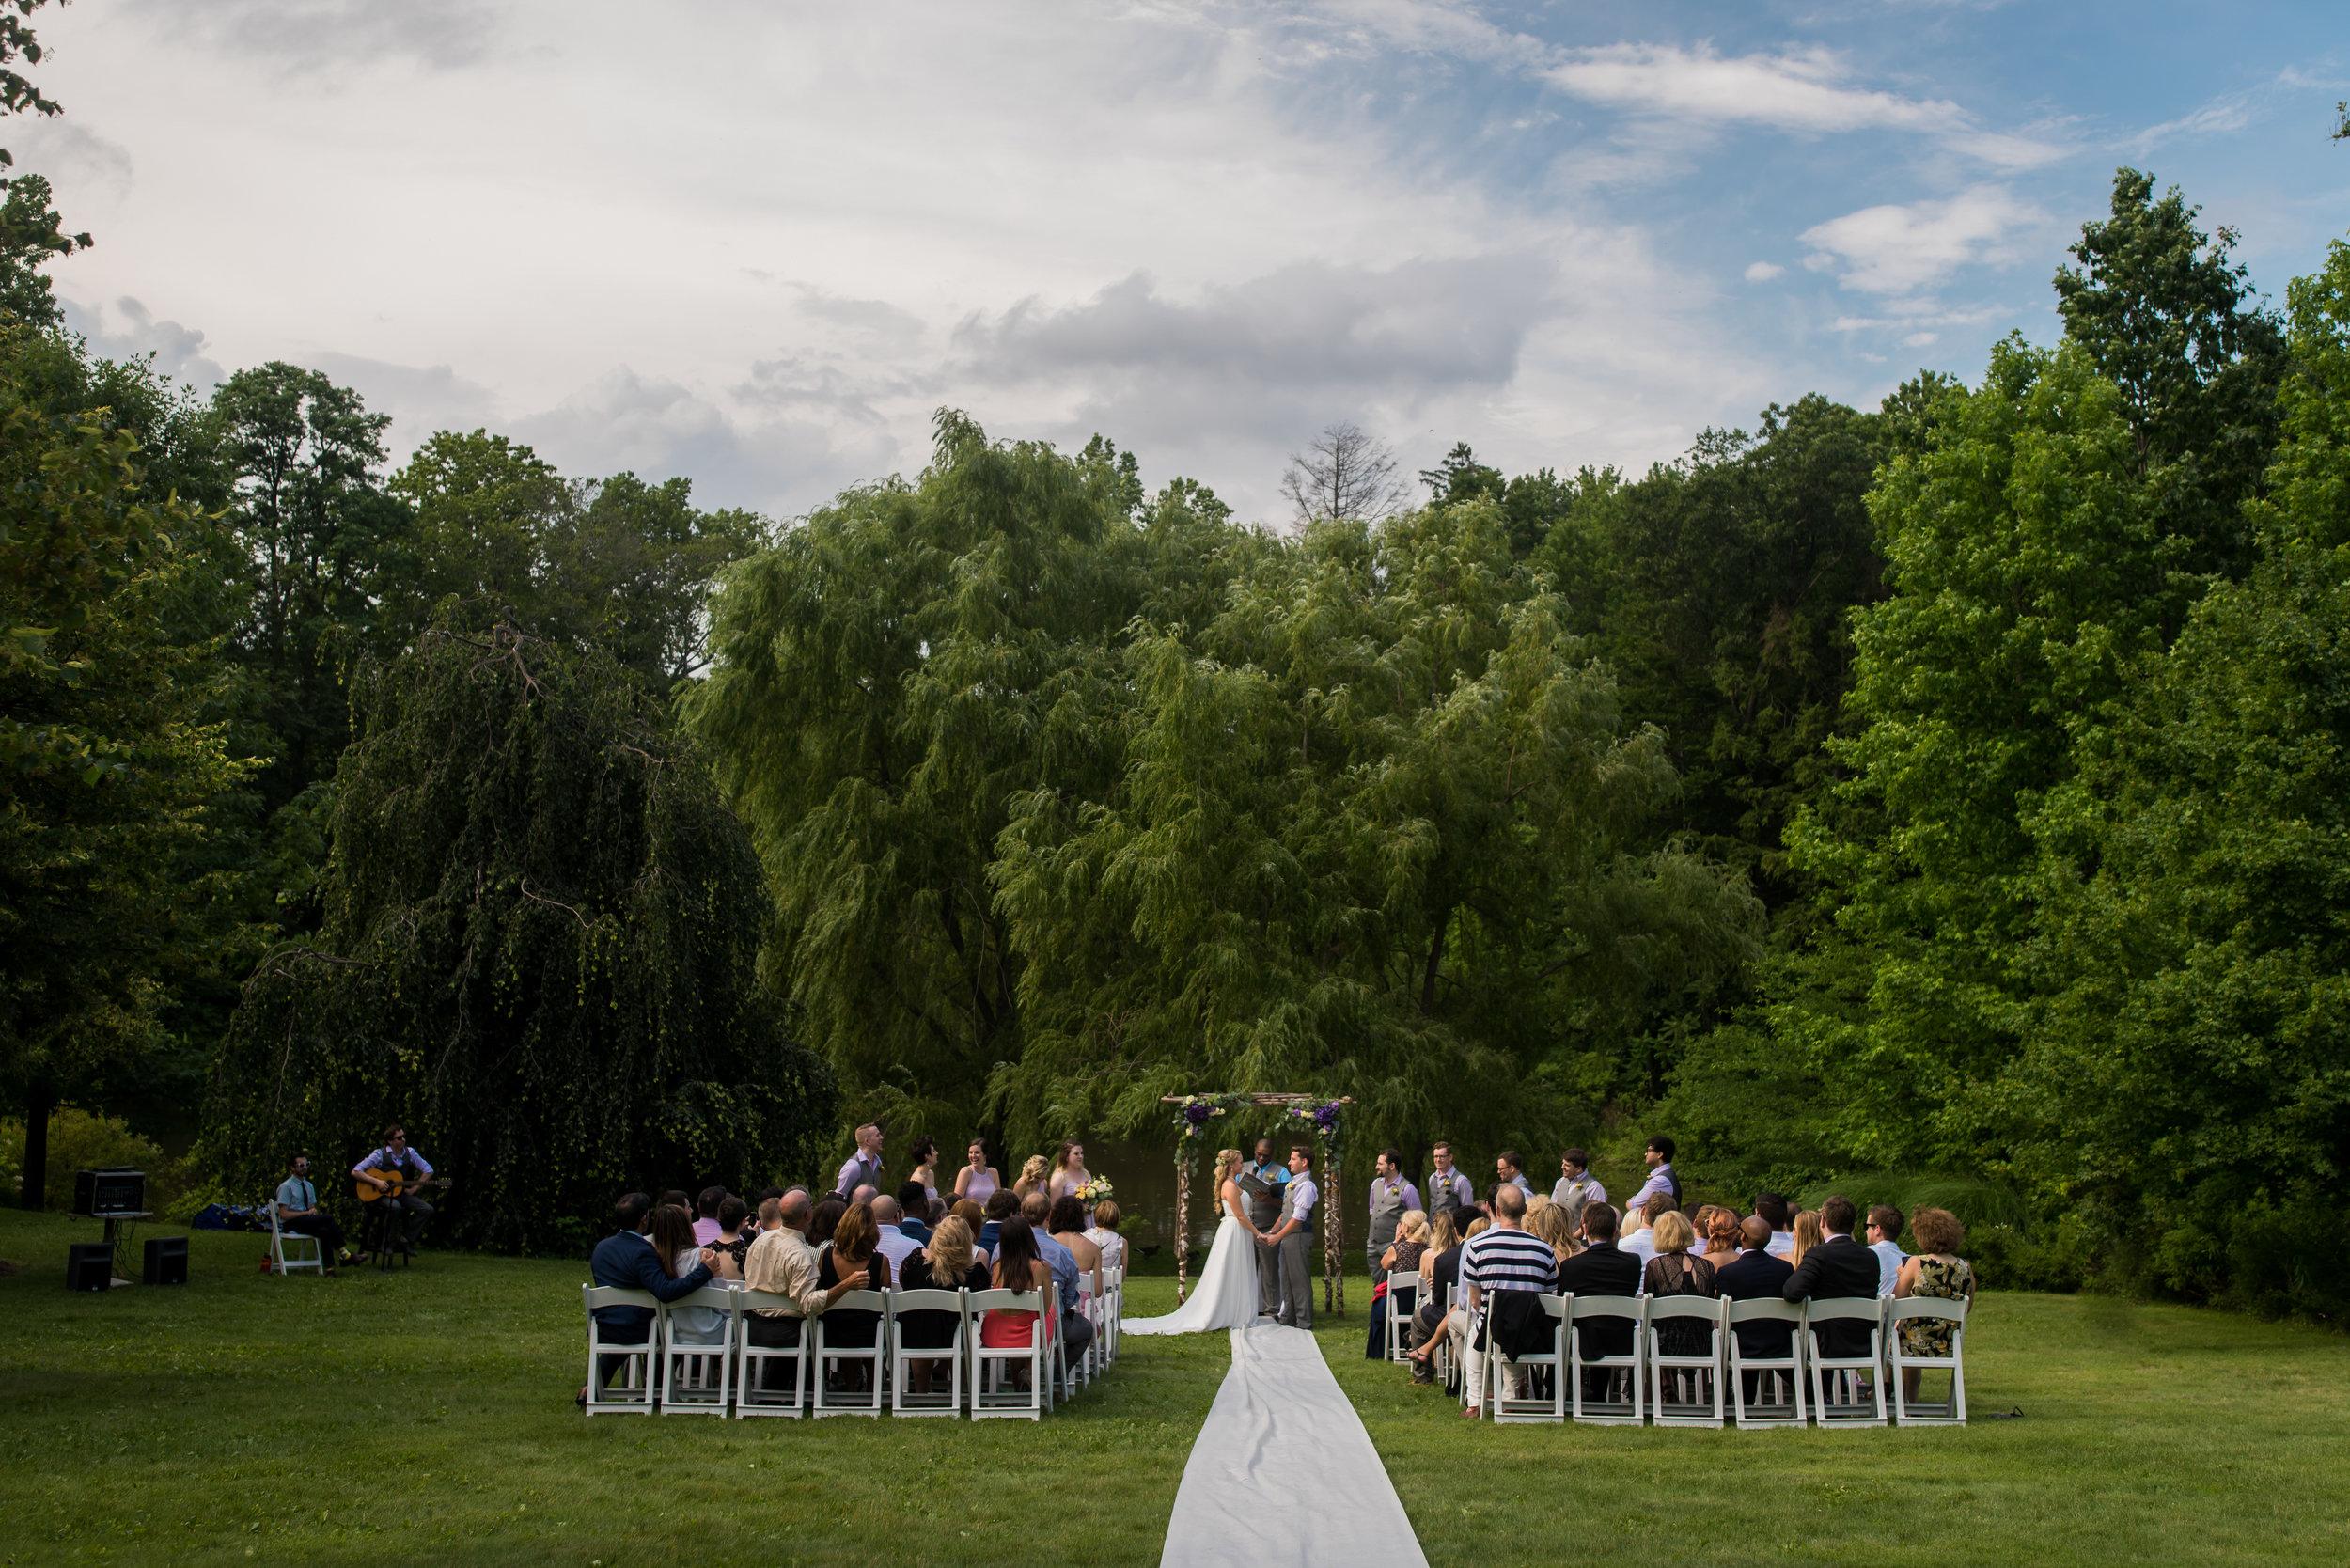 Stefy Hilmer Photography- overview buttermilk falls wedding venue.jpg